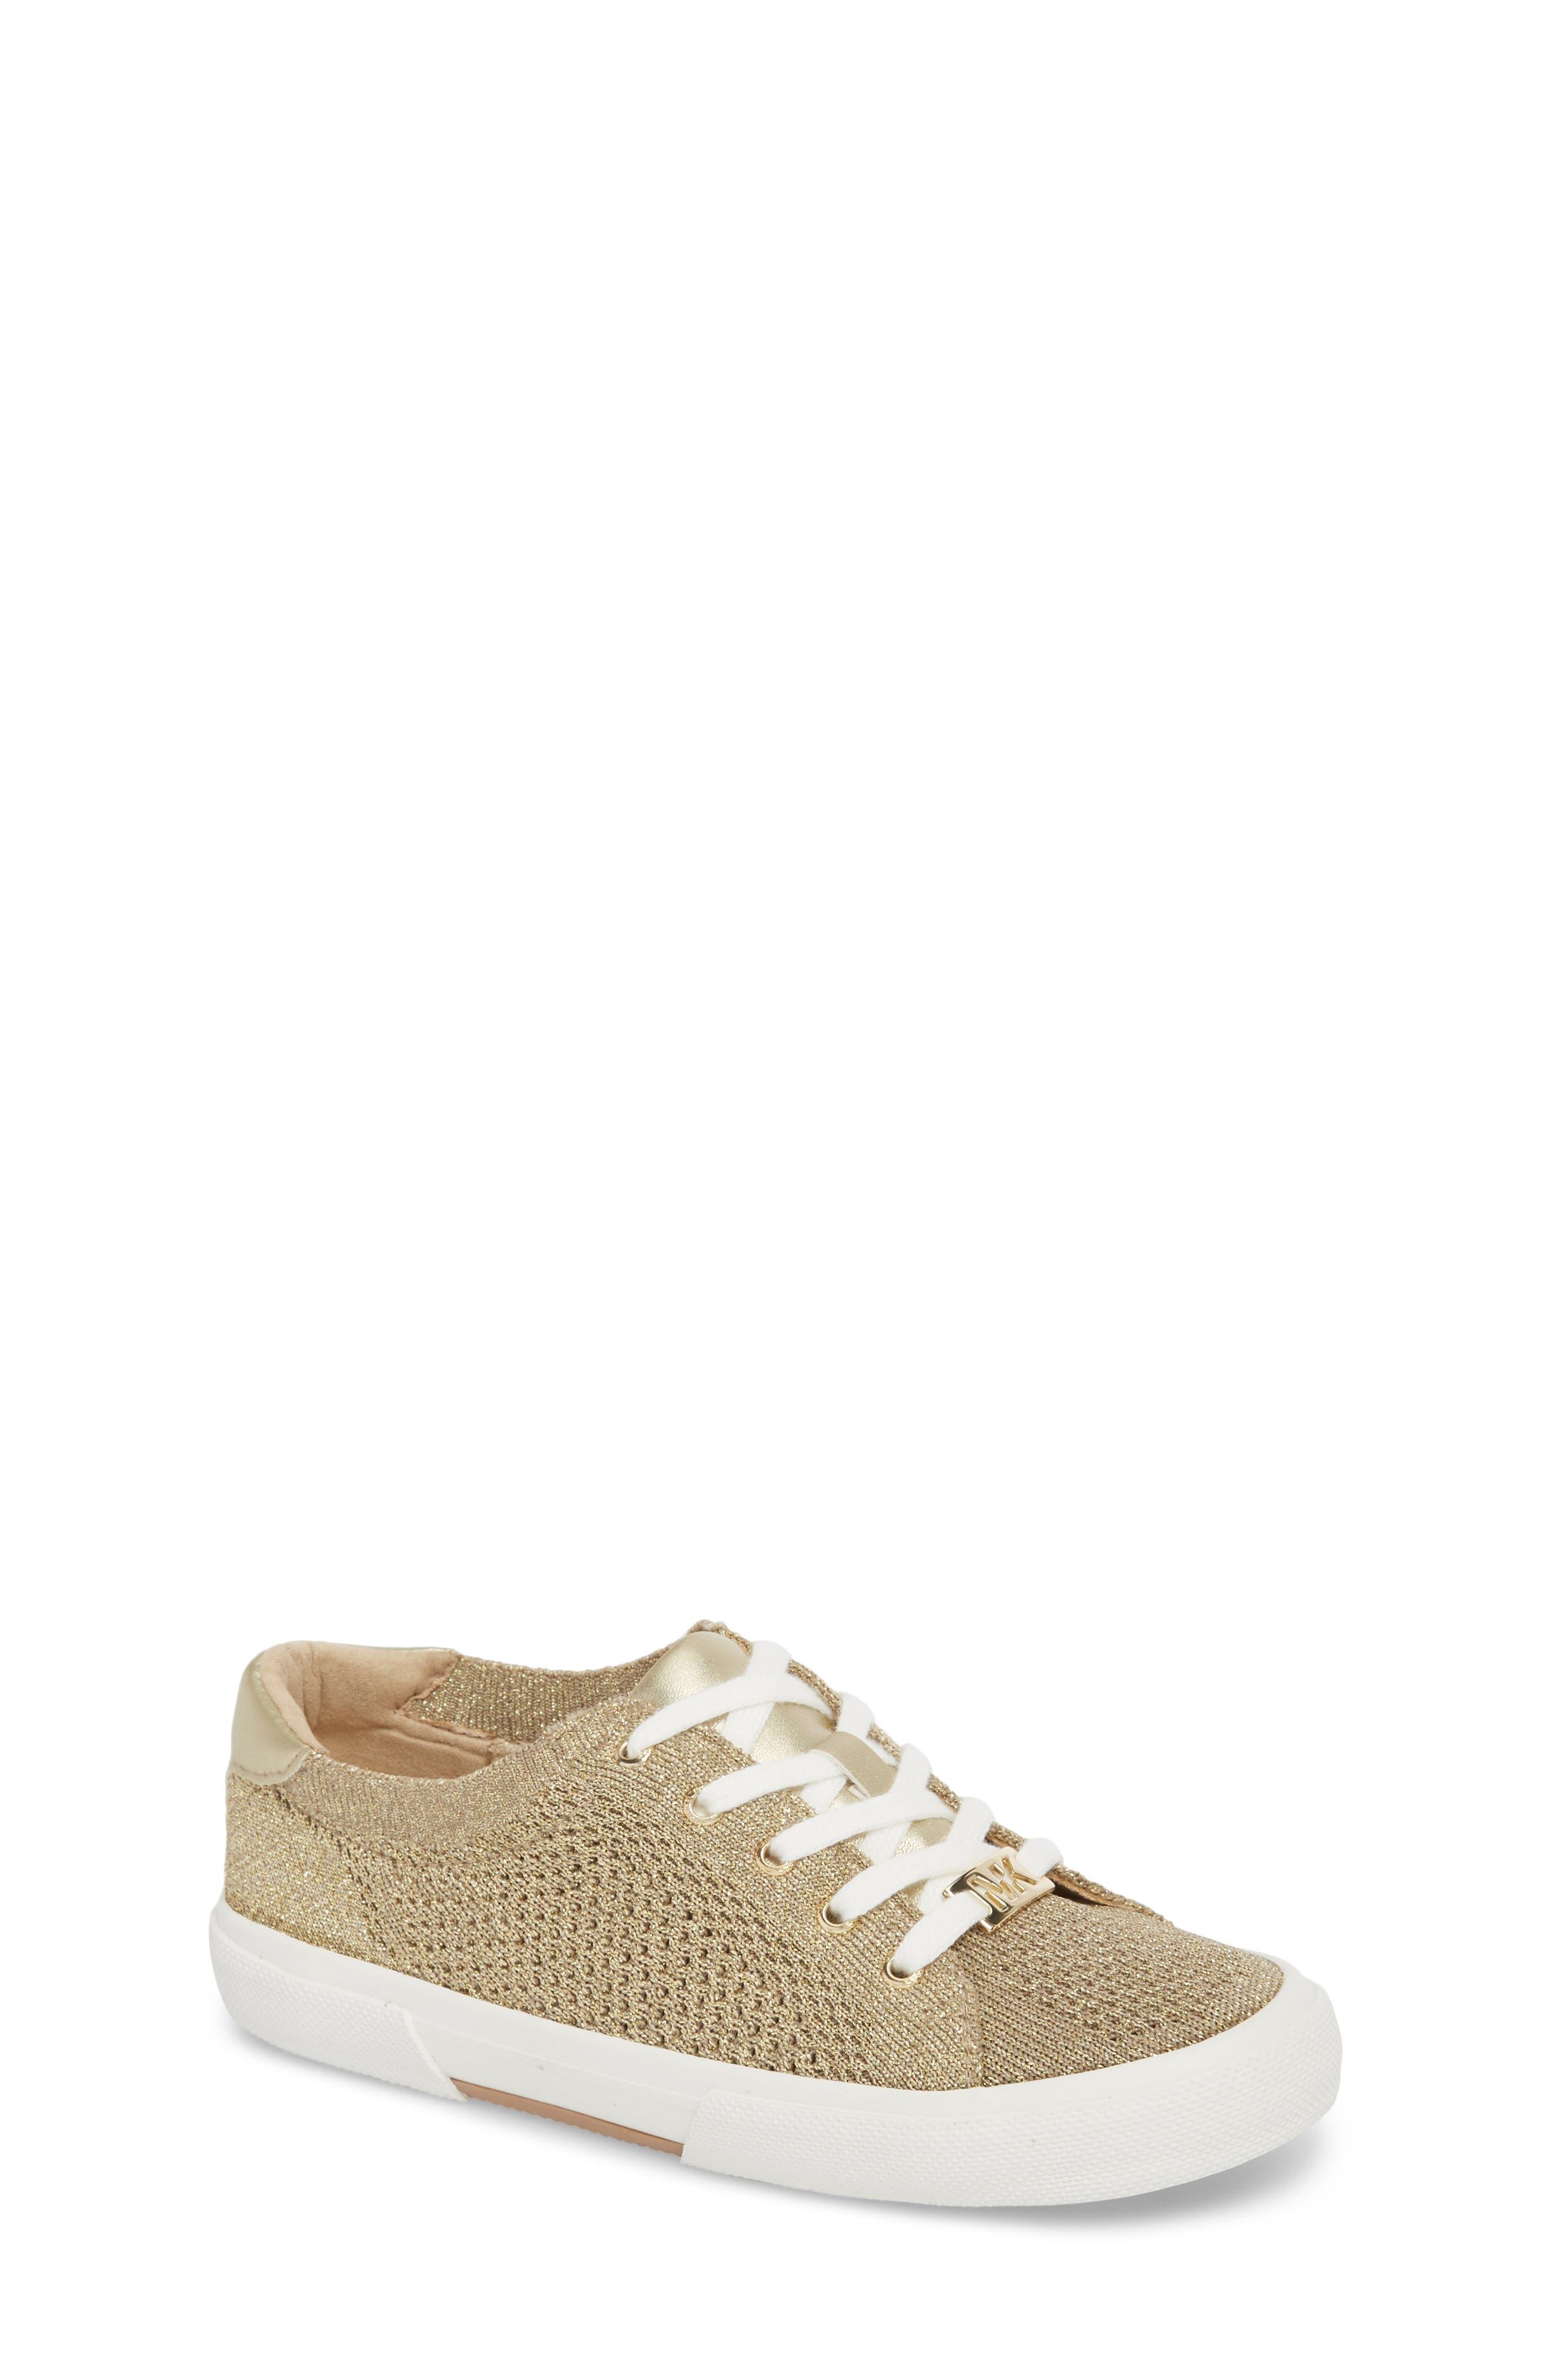 Ima Metallic Knit Sneaker,                             Main thumbnail 1, color,                             Gold